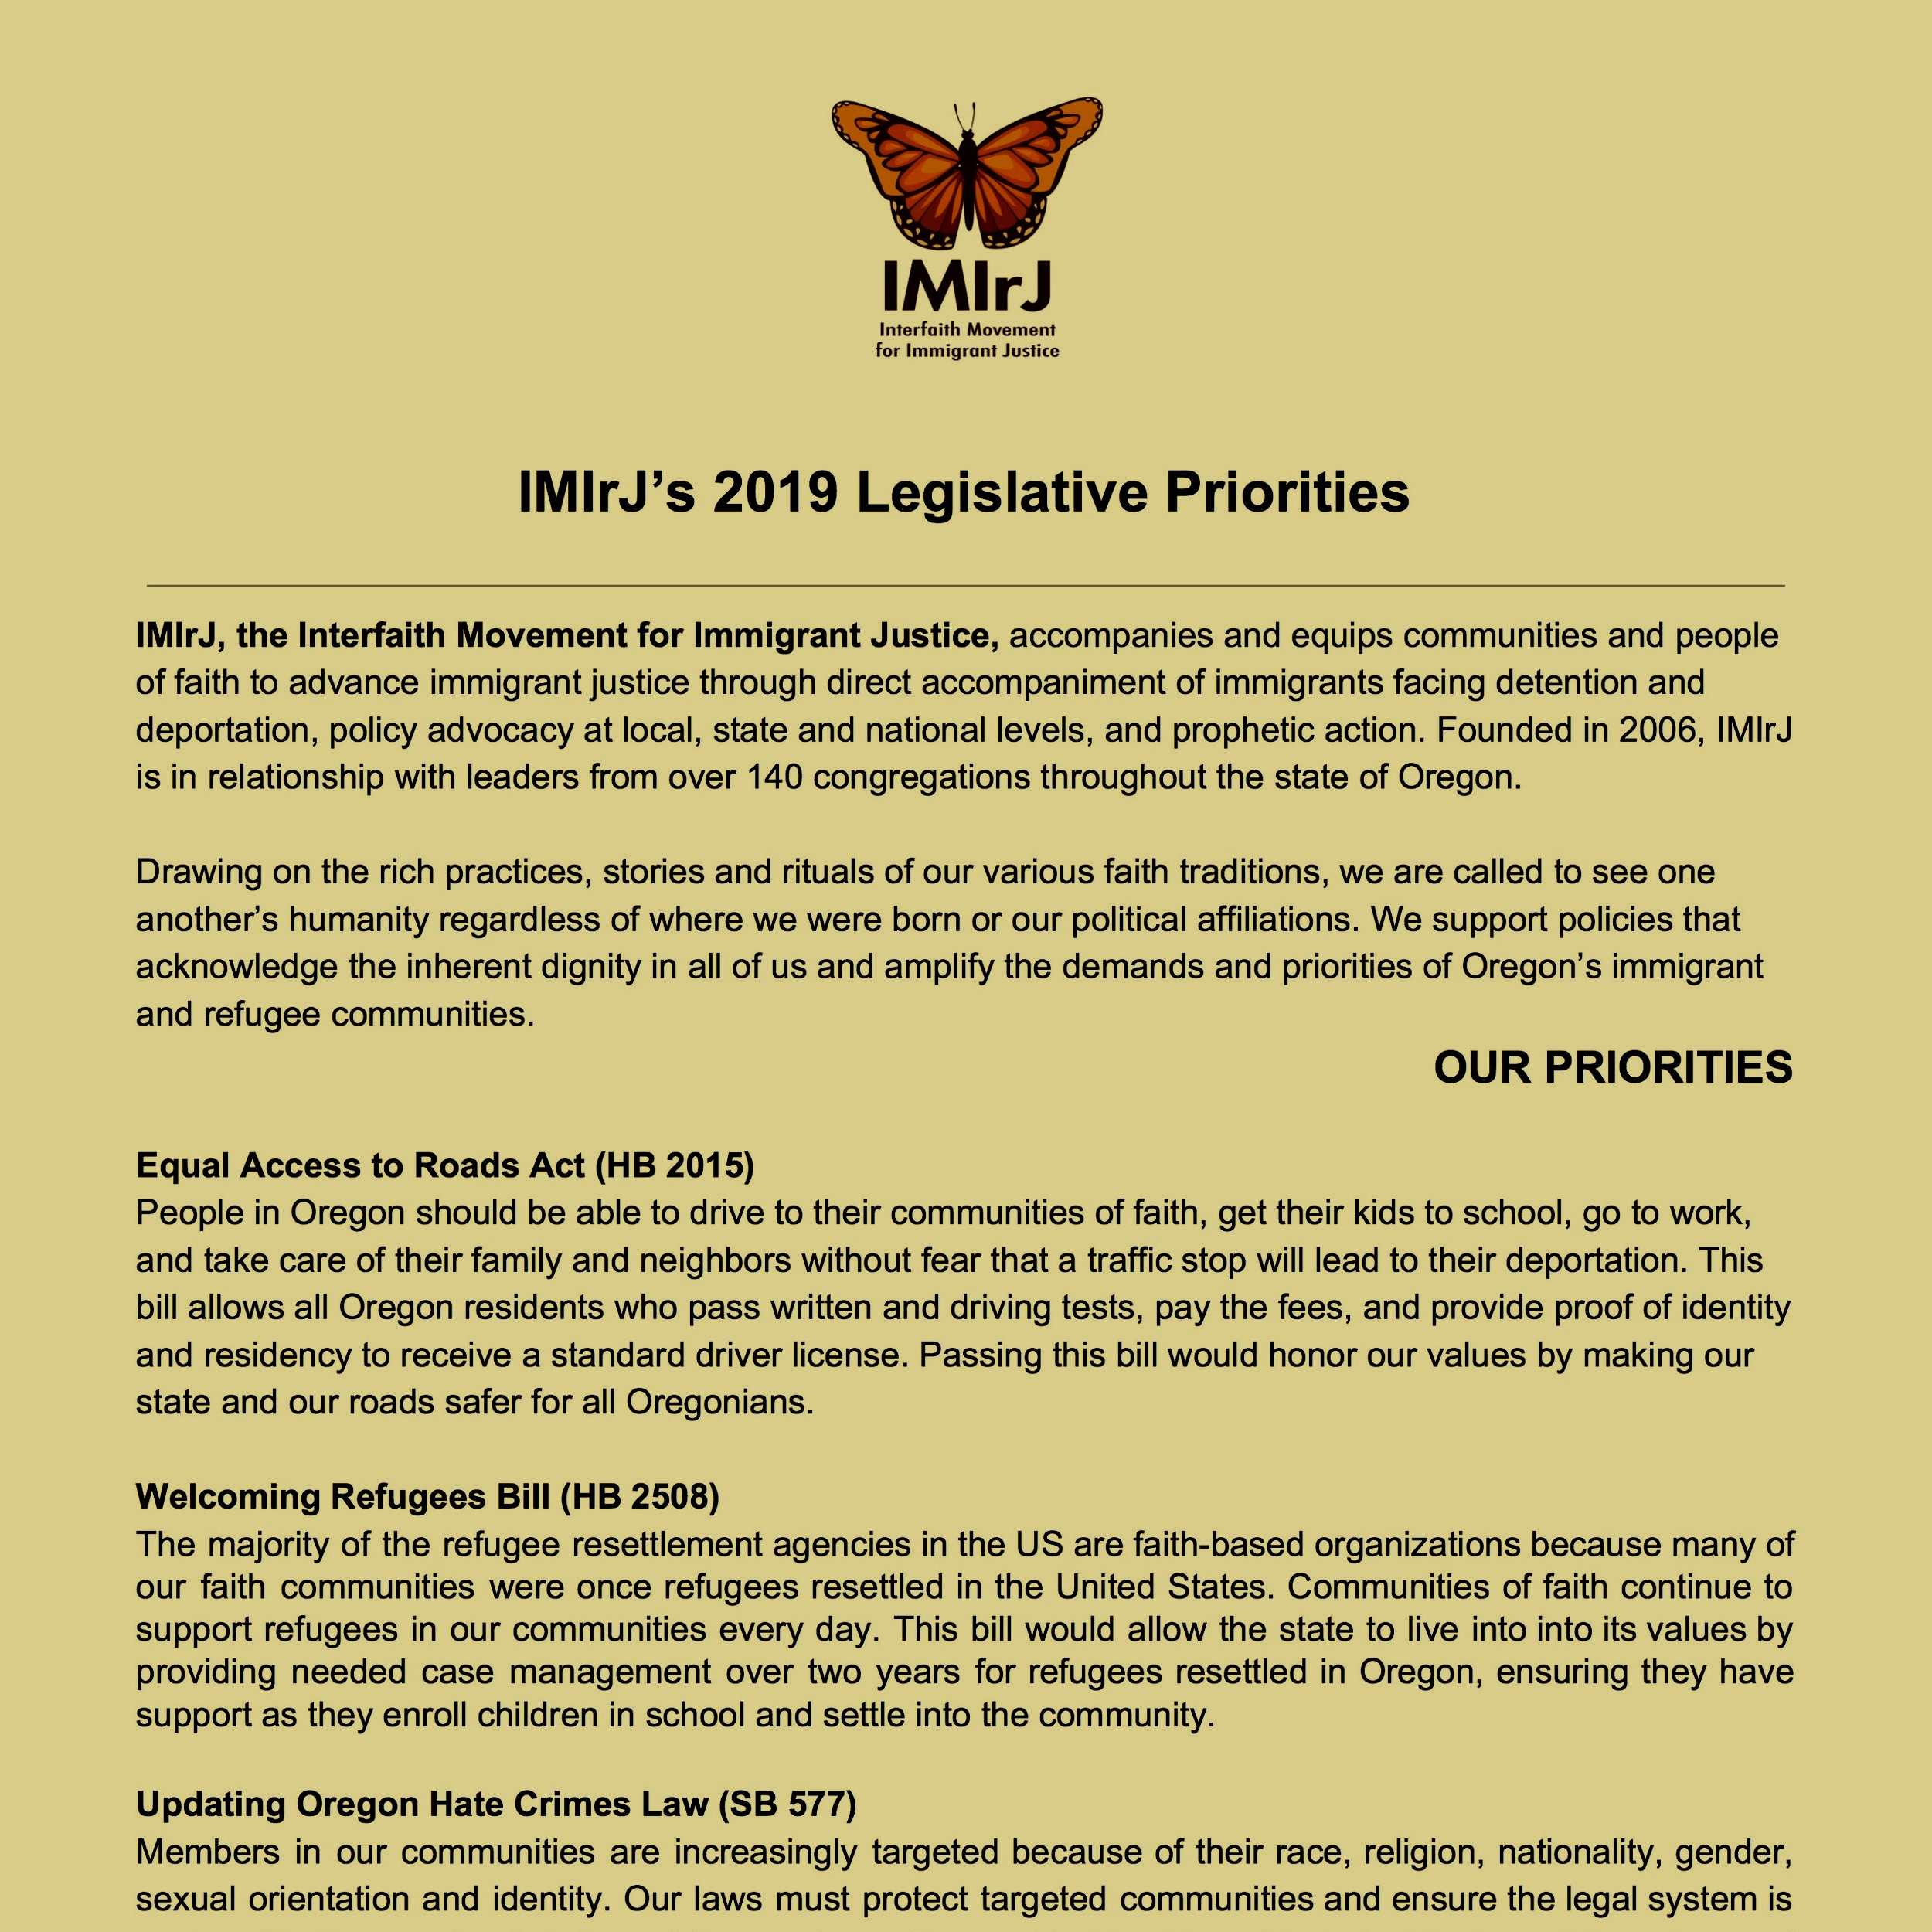 IMIrJ Legislative Priorities